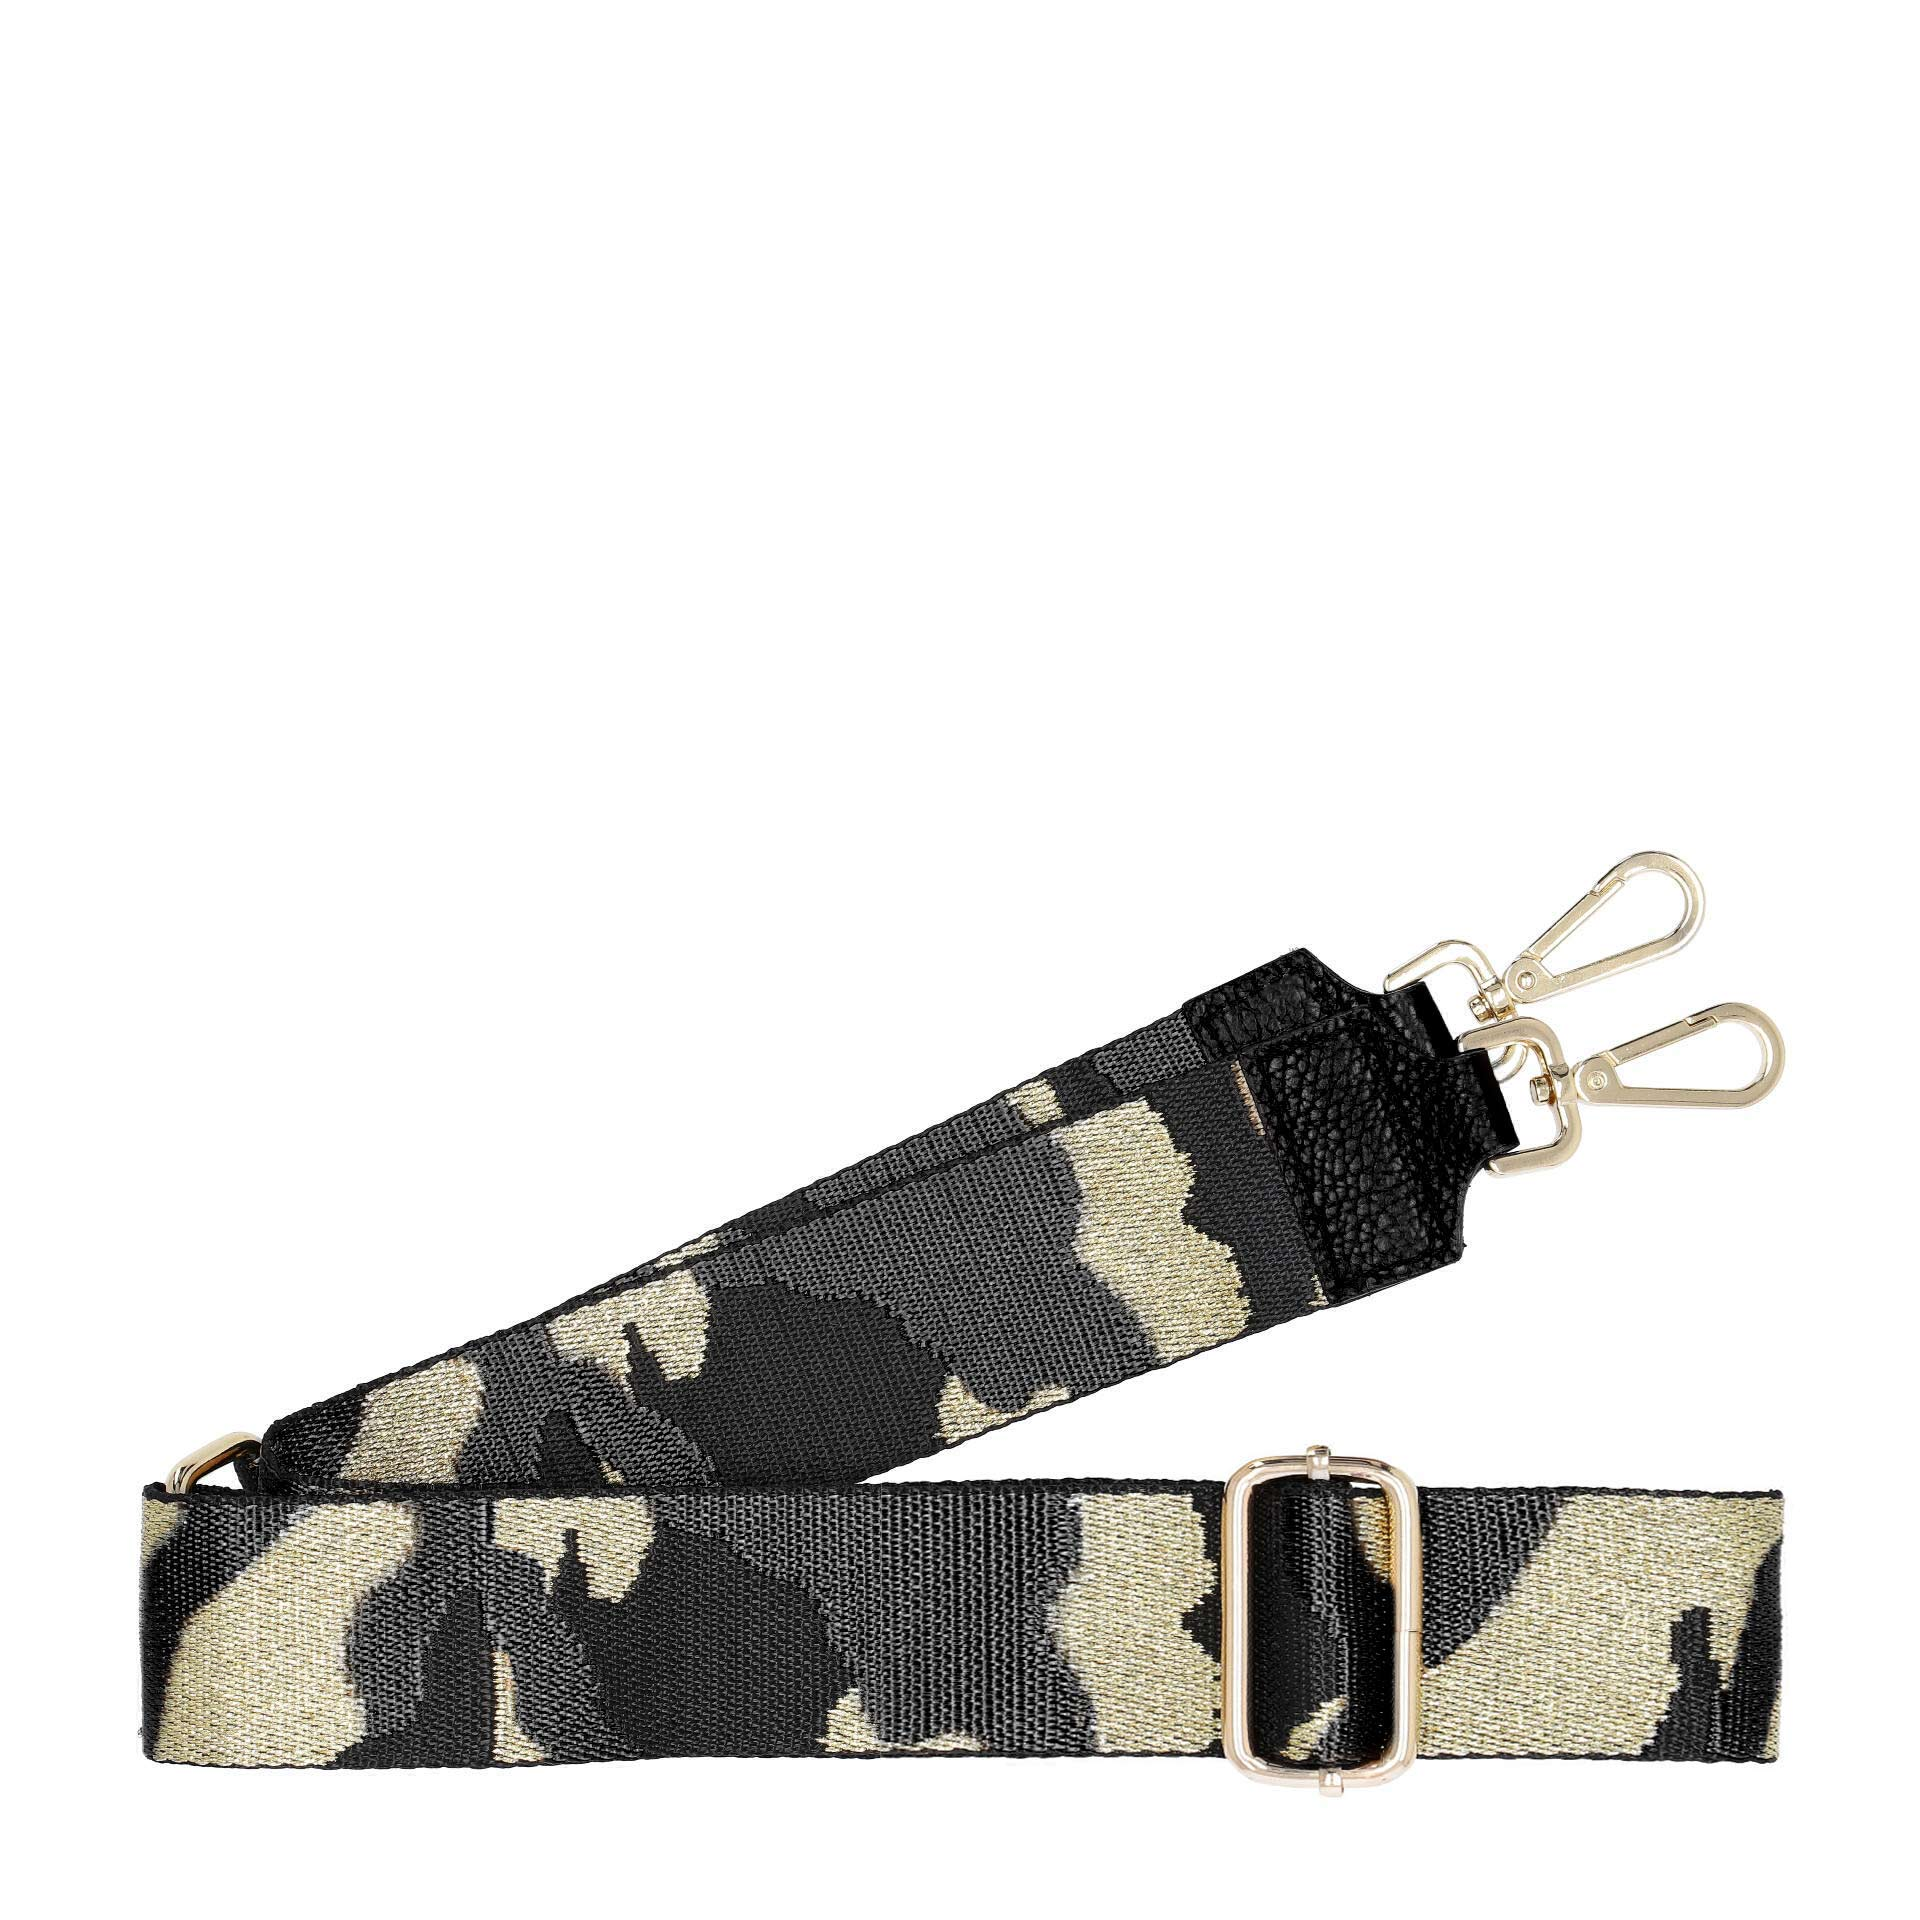 LEOKA Neobag Schulter Strap Camouflage